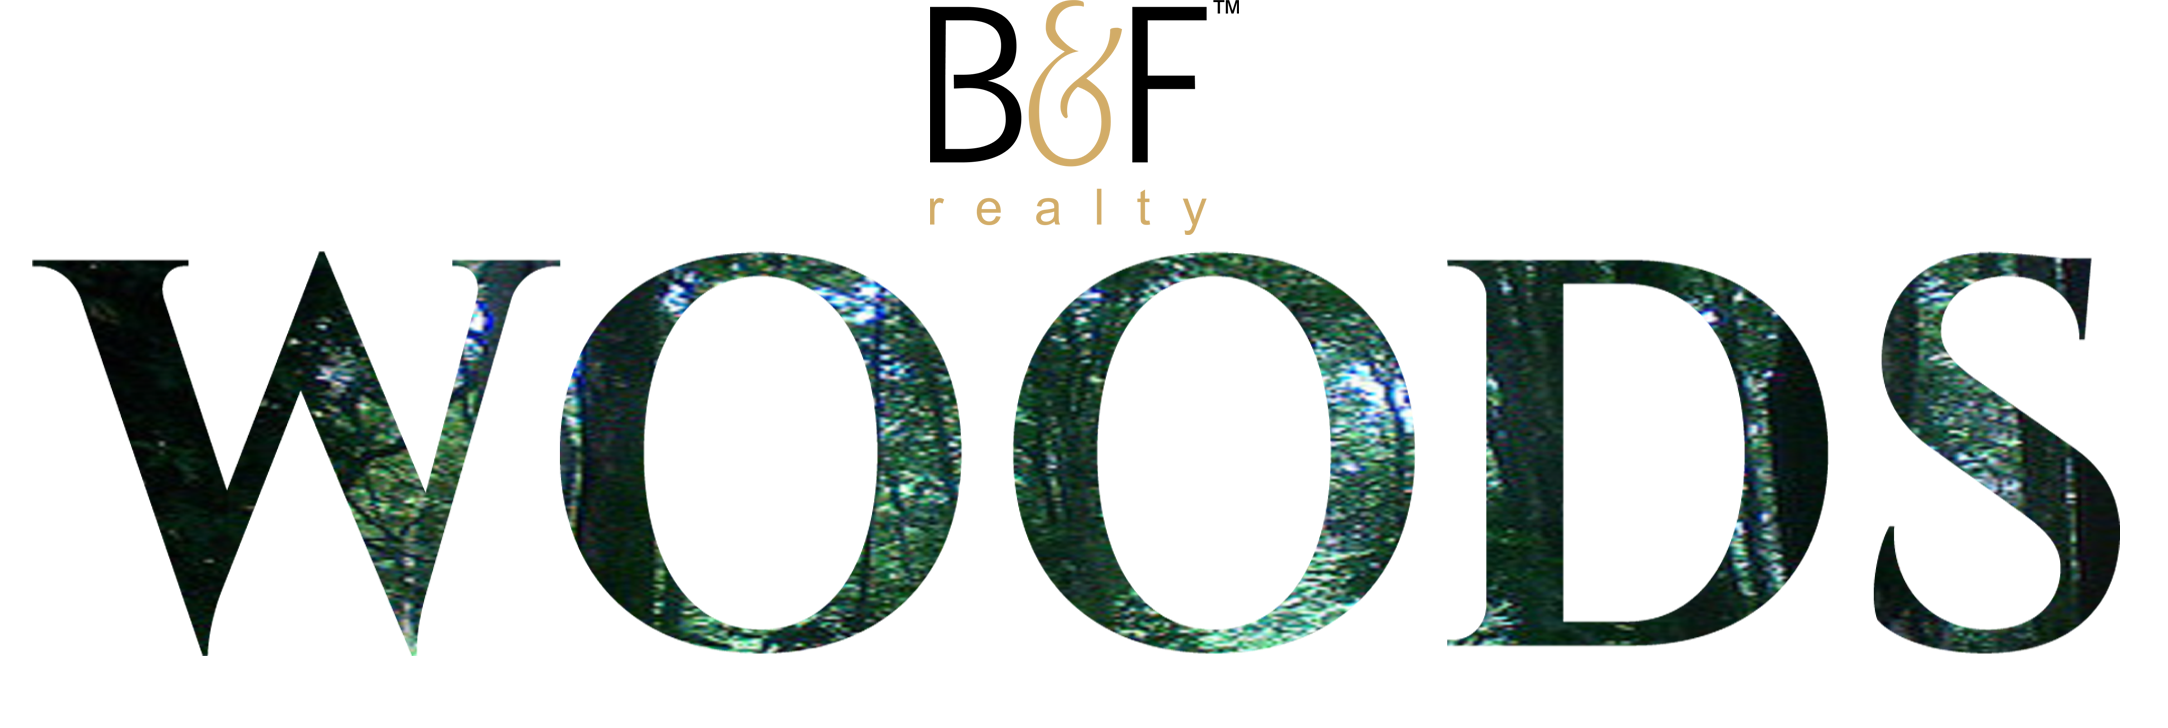 LOGO - B and F Woods